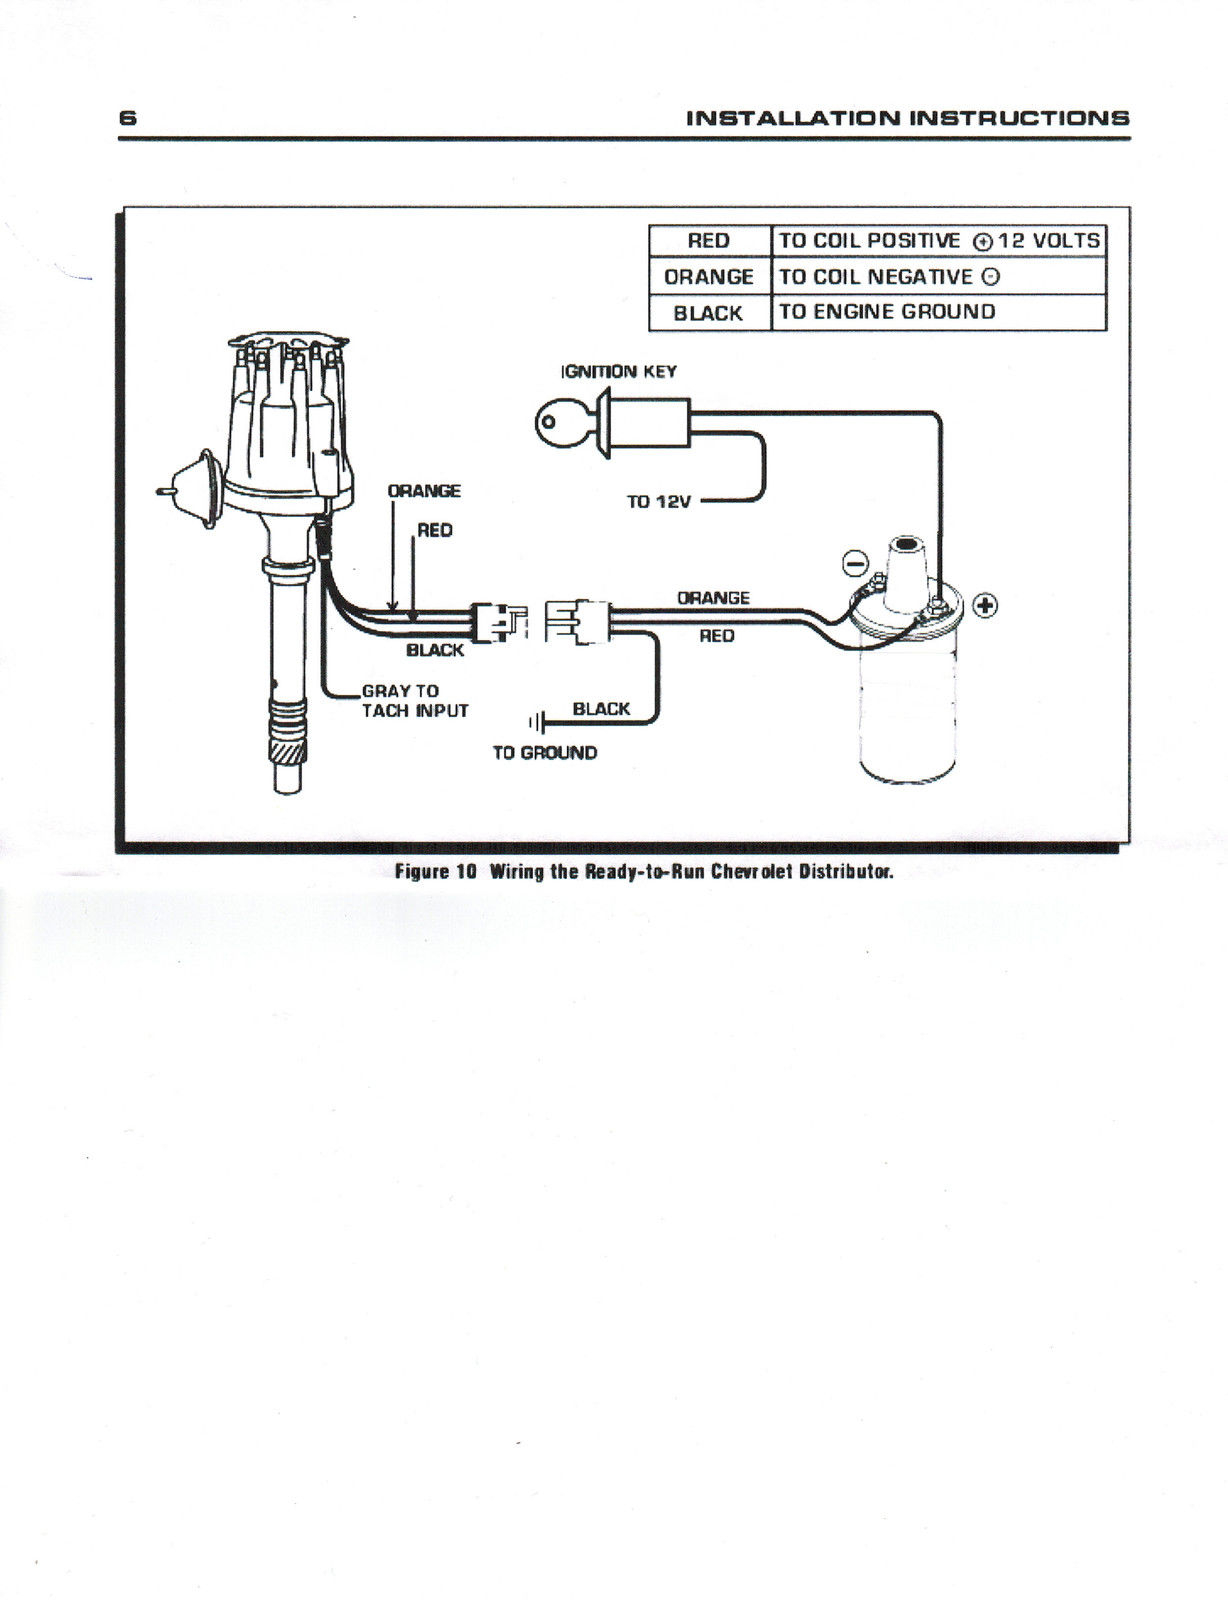 Diagram] 87 Ford 351 Distributor Wiring Diagram Full Version